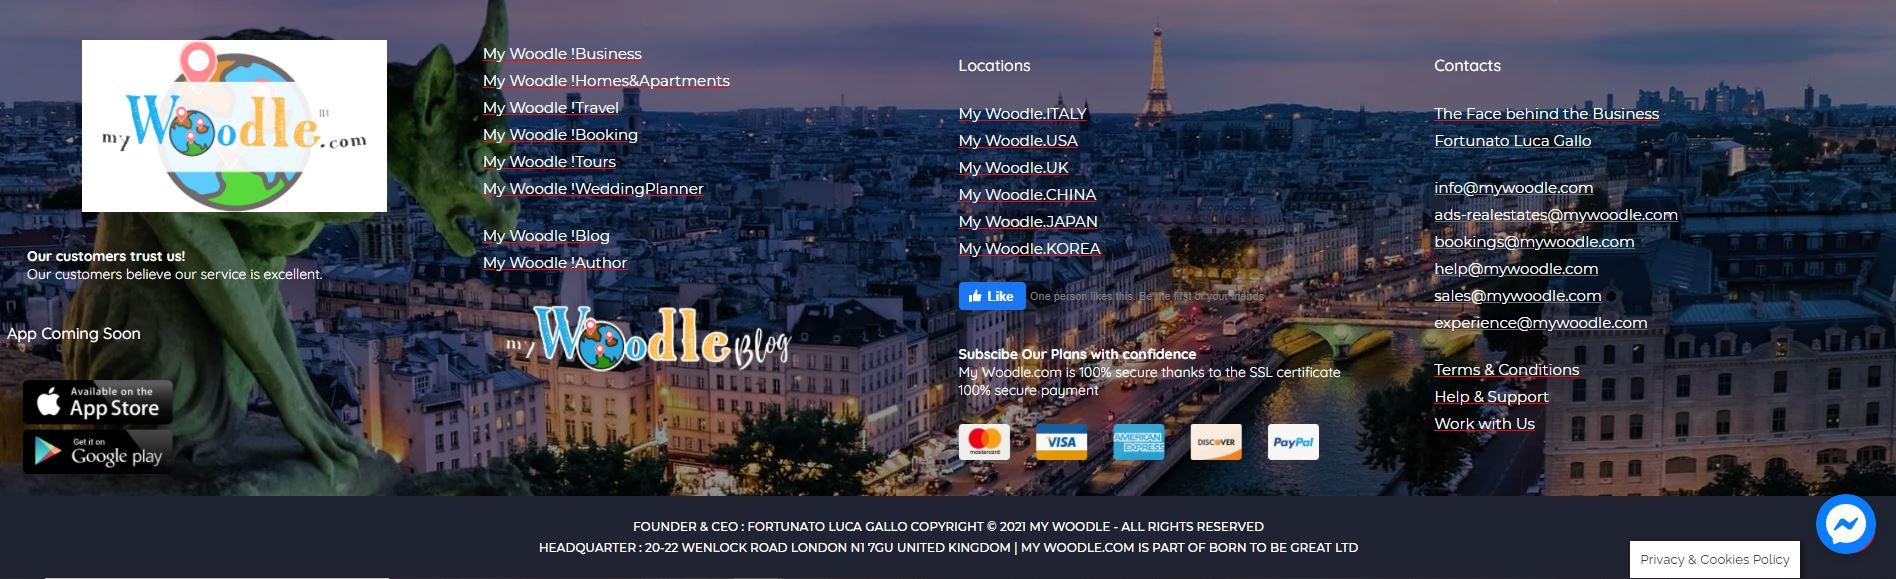 mywoodle-startup-hirostudios-fortunato-luca-gallo-006